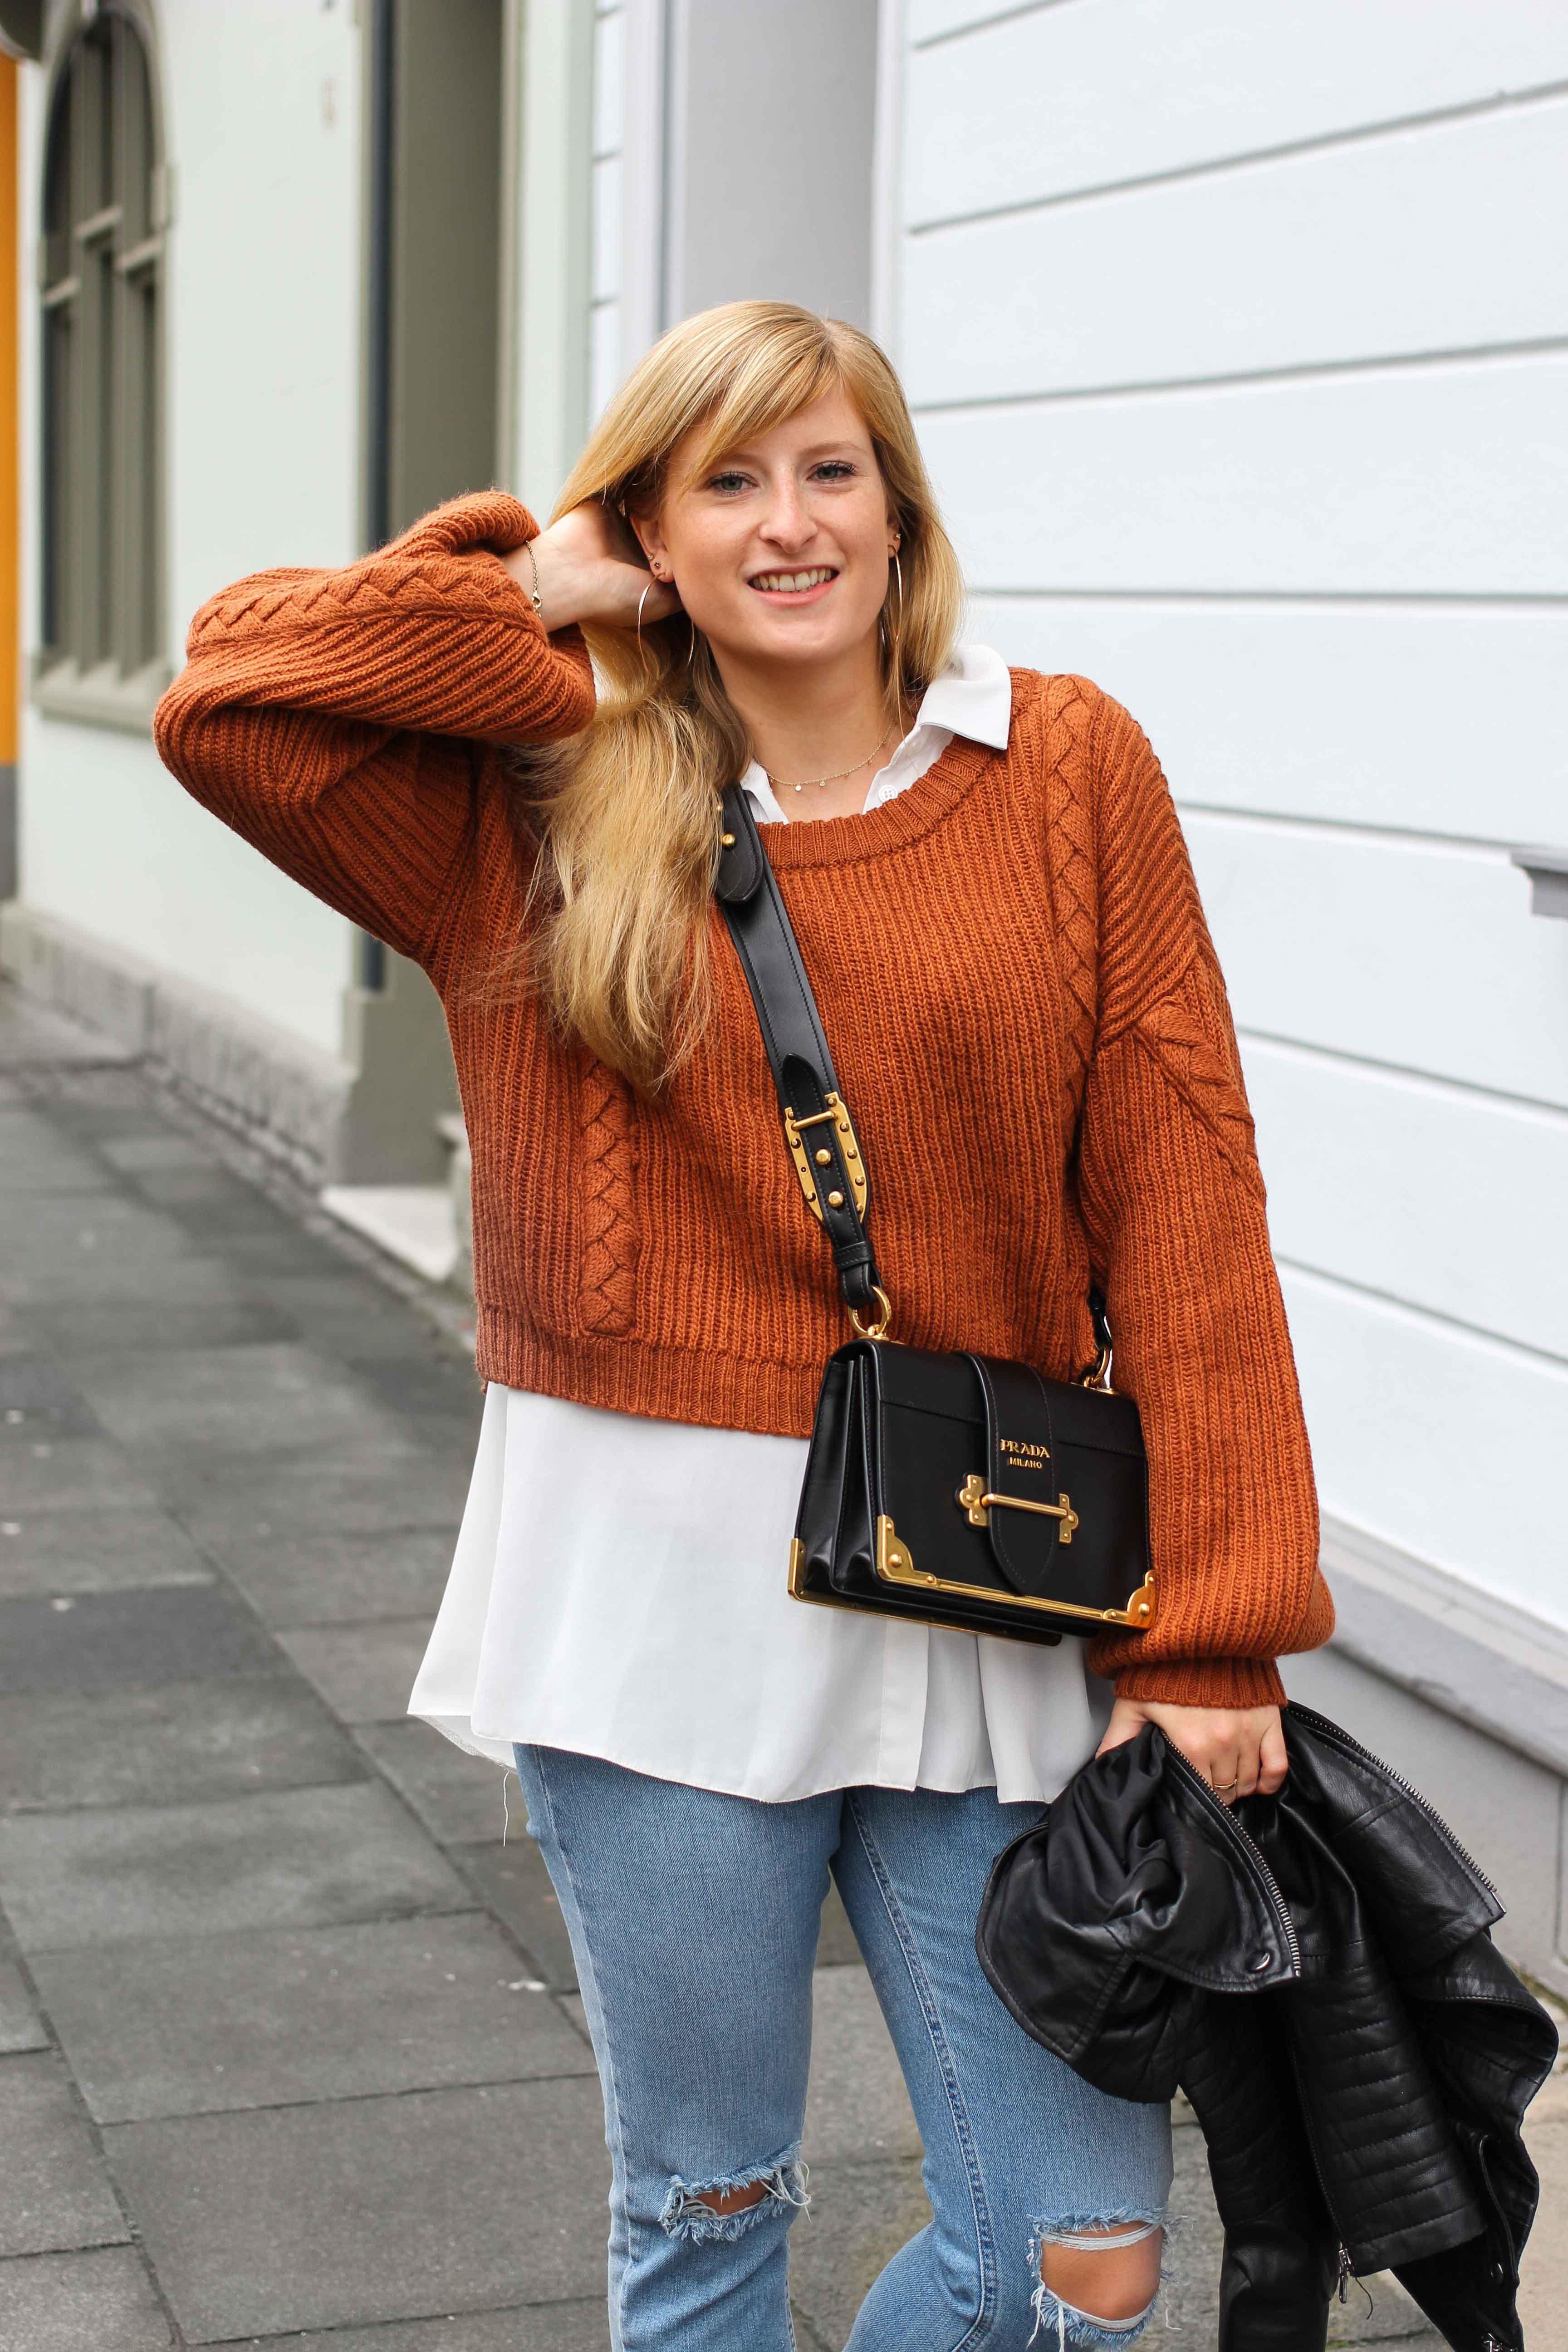 Übergangslook Crop Wollpullover Layering Bluse kombinieren zerrissene Jeans Modeblog Outfit Streetstyle Köln 2